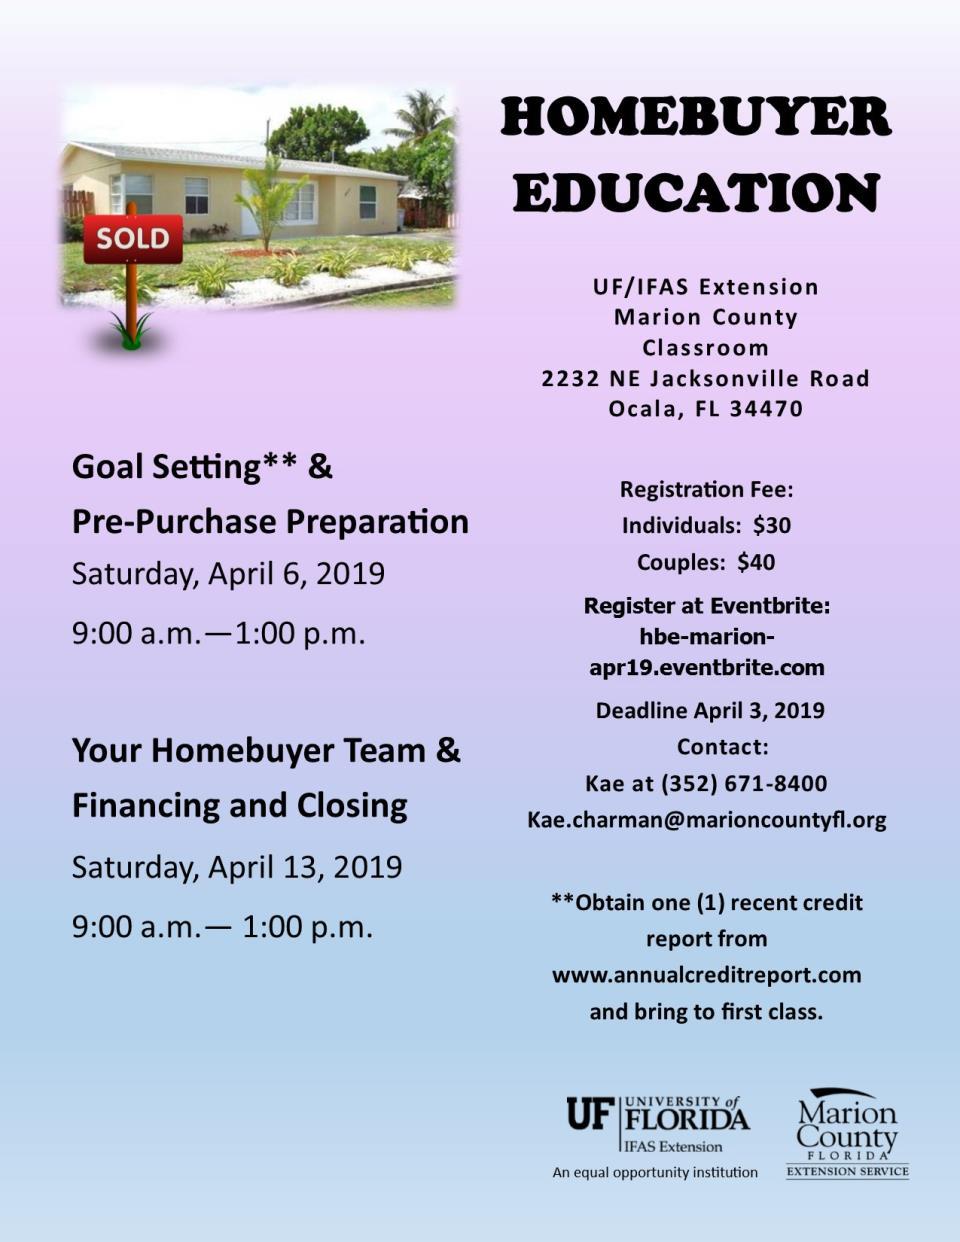 Uf Calendar Of Events.Marion County Calendar Of Events Marion County Fl